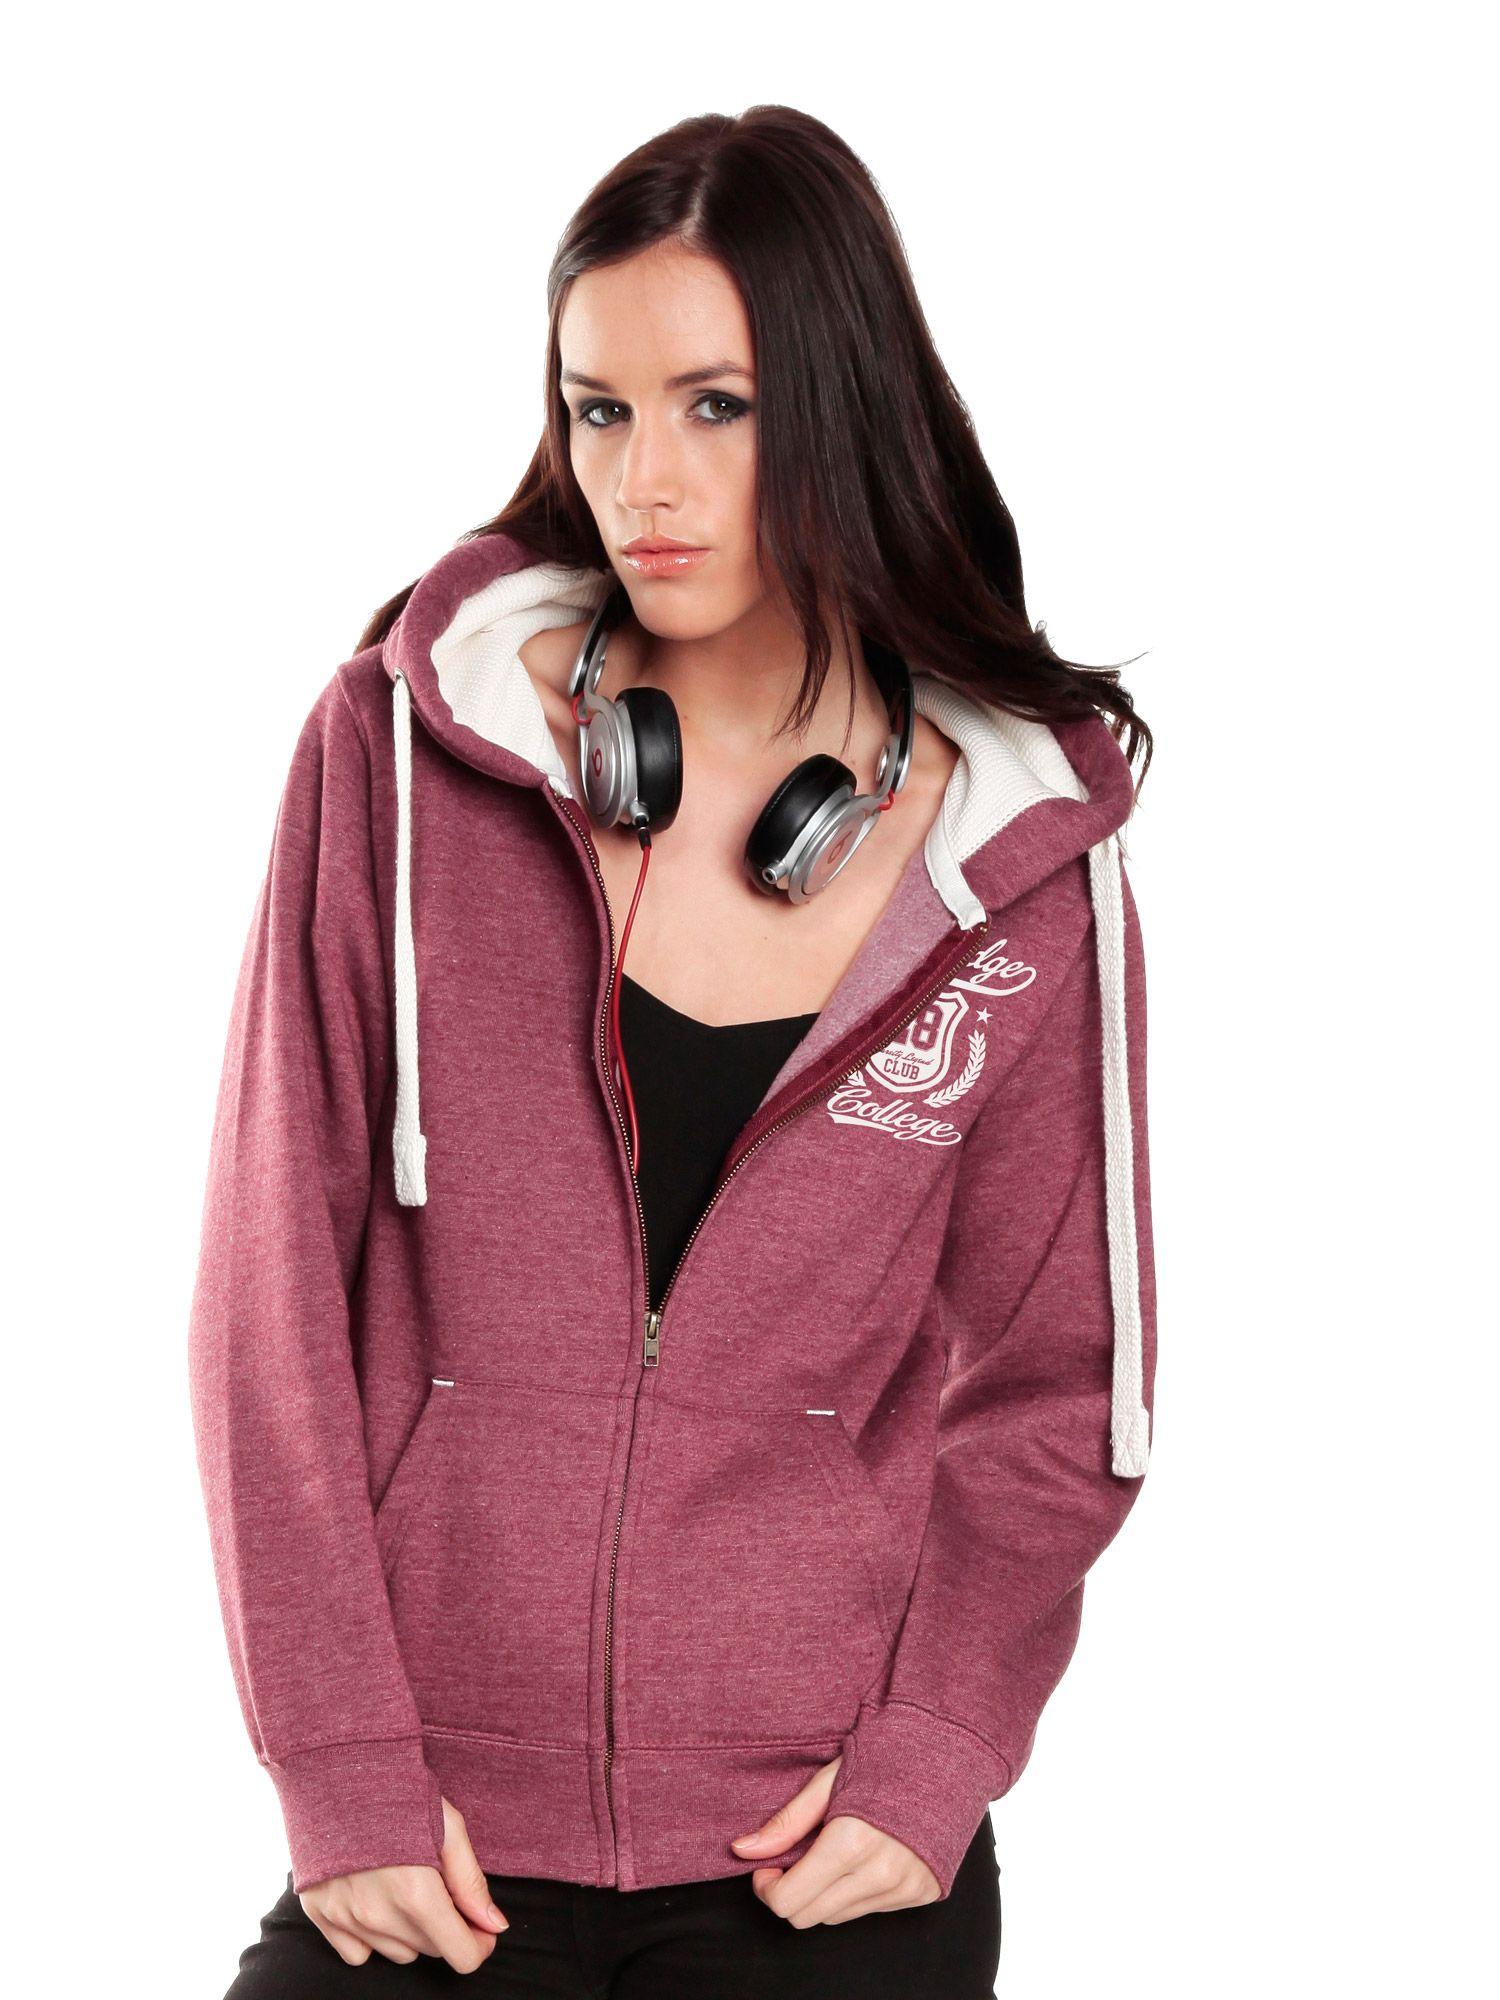 6a655350b9e0 W81PF-CT02LB-Ultra Premium Zip Hoodie Ultra Soft Feel Hooded Top ...